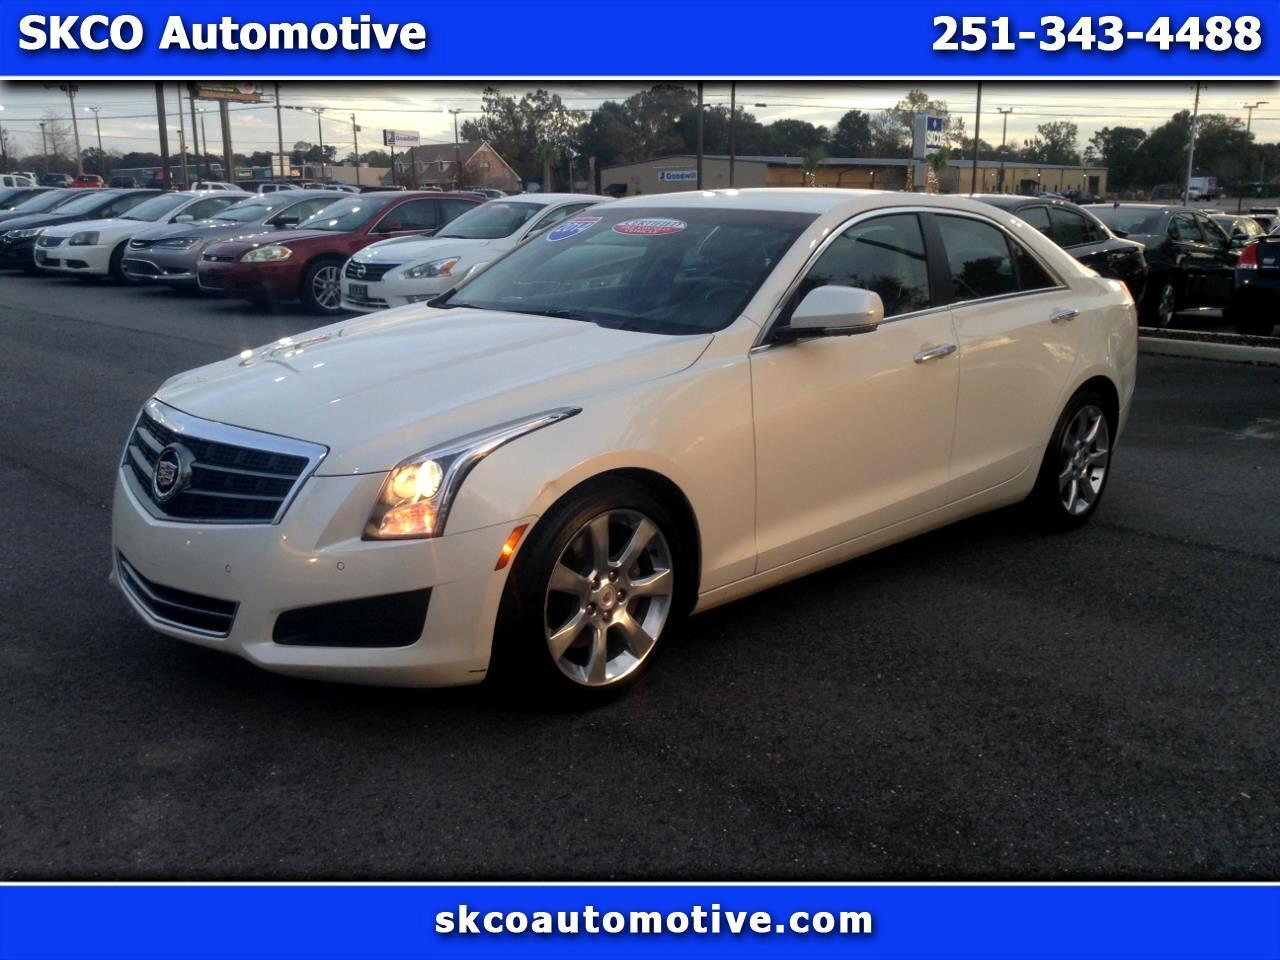 2014 Cadillac ATS 4dr Sdn 2.5L Luxury RWD